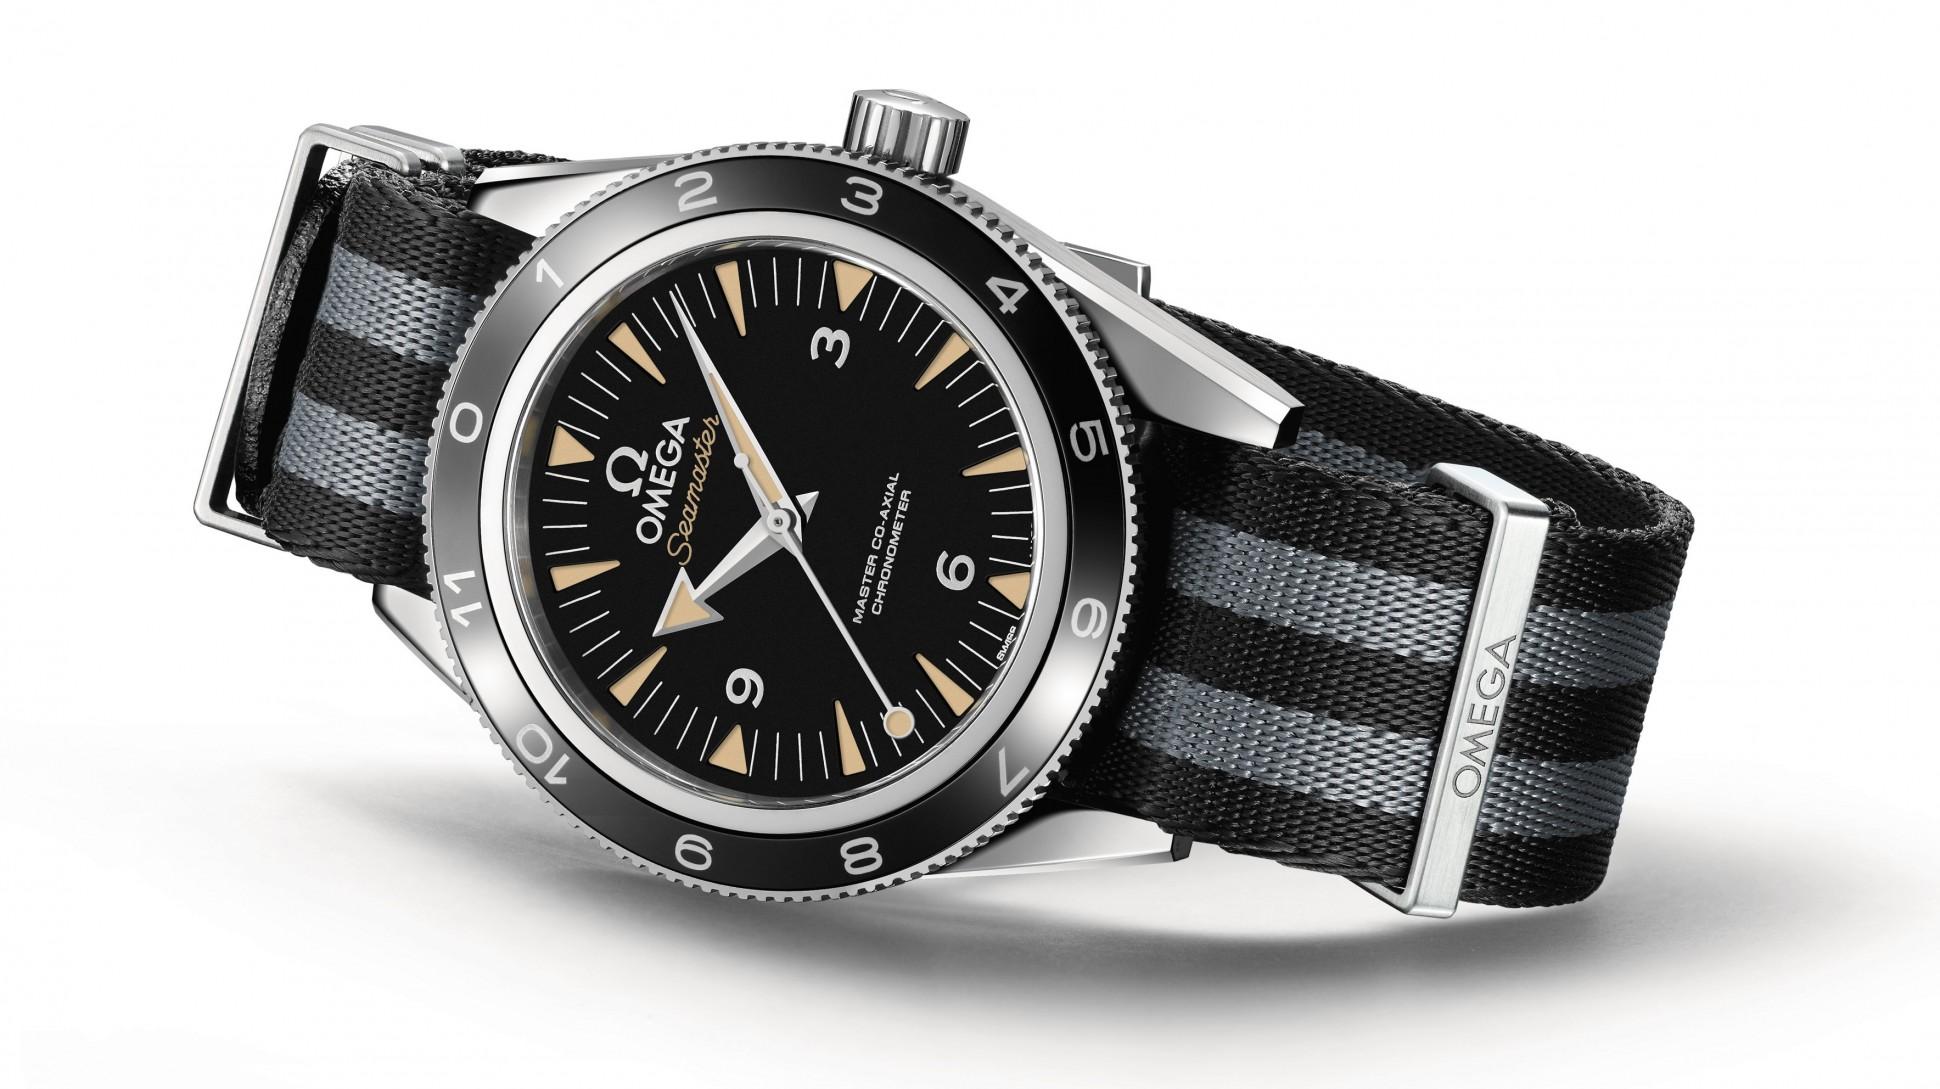 omega watches uk sale